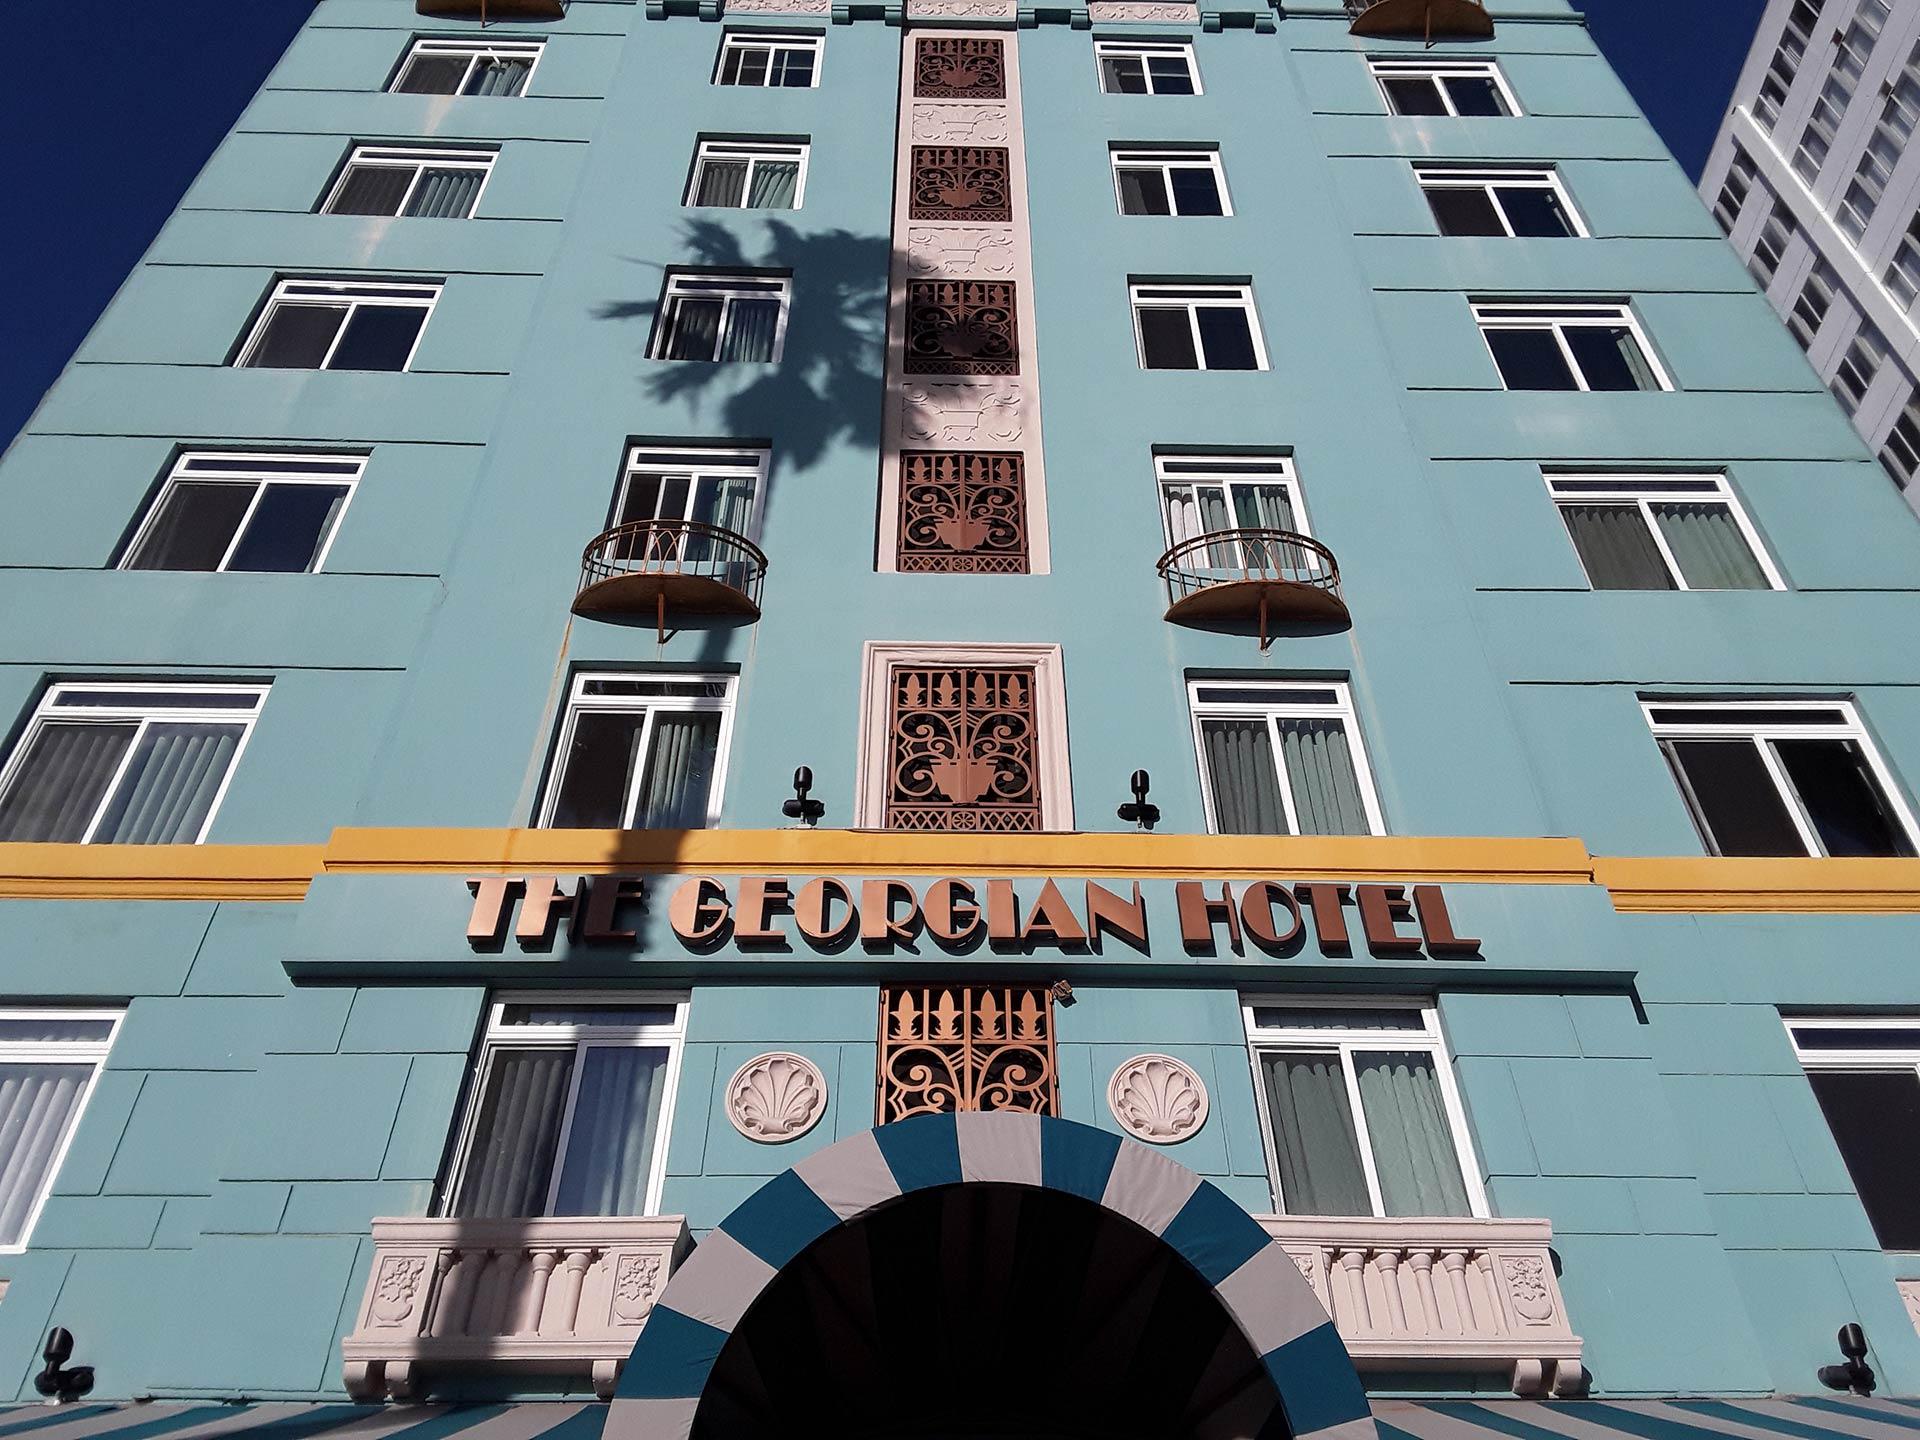 The Georgian Hotel | Sandi Hemmerlein